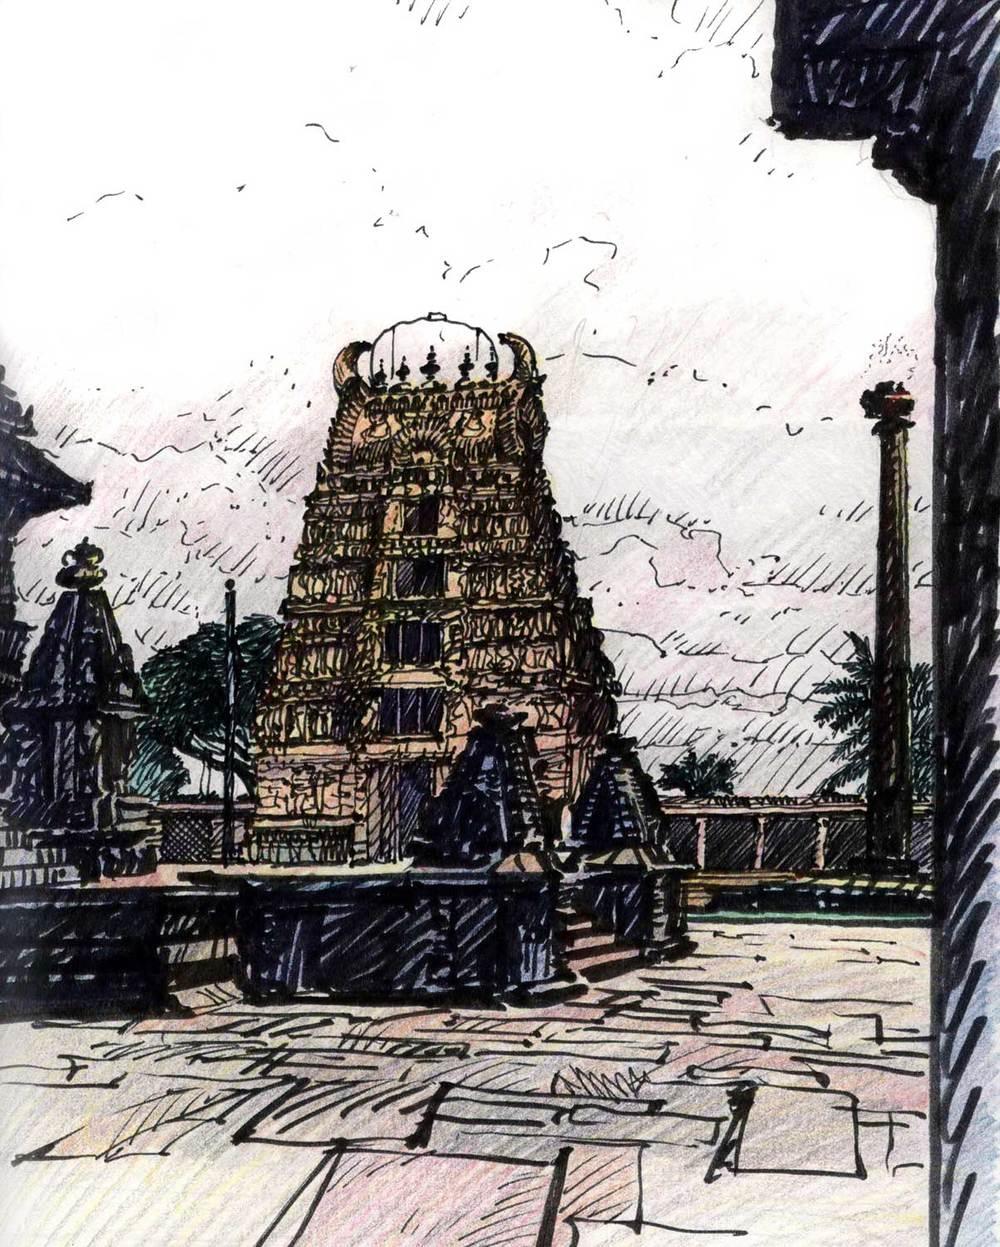 Belur Temple, Belur, India.  Felt-tip pen and colored pencil.